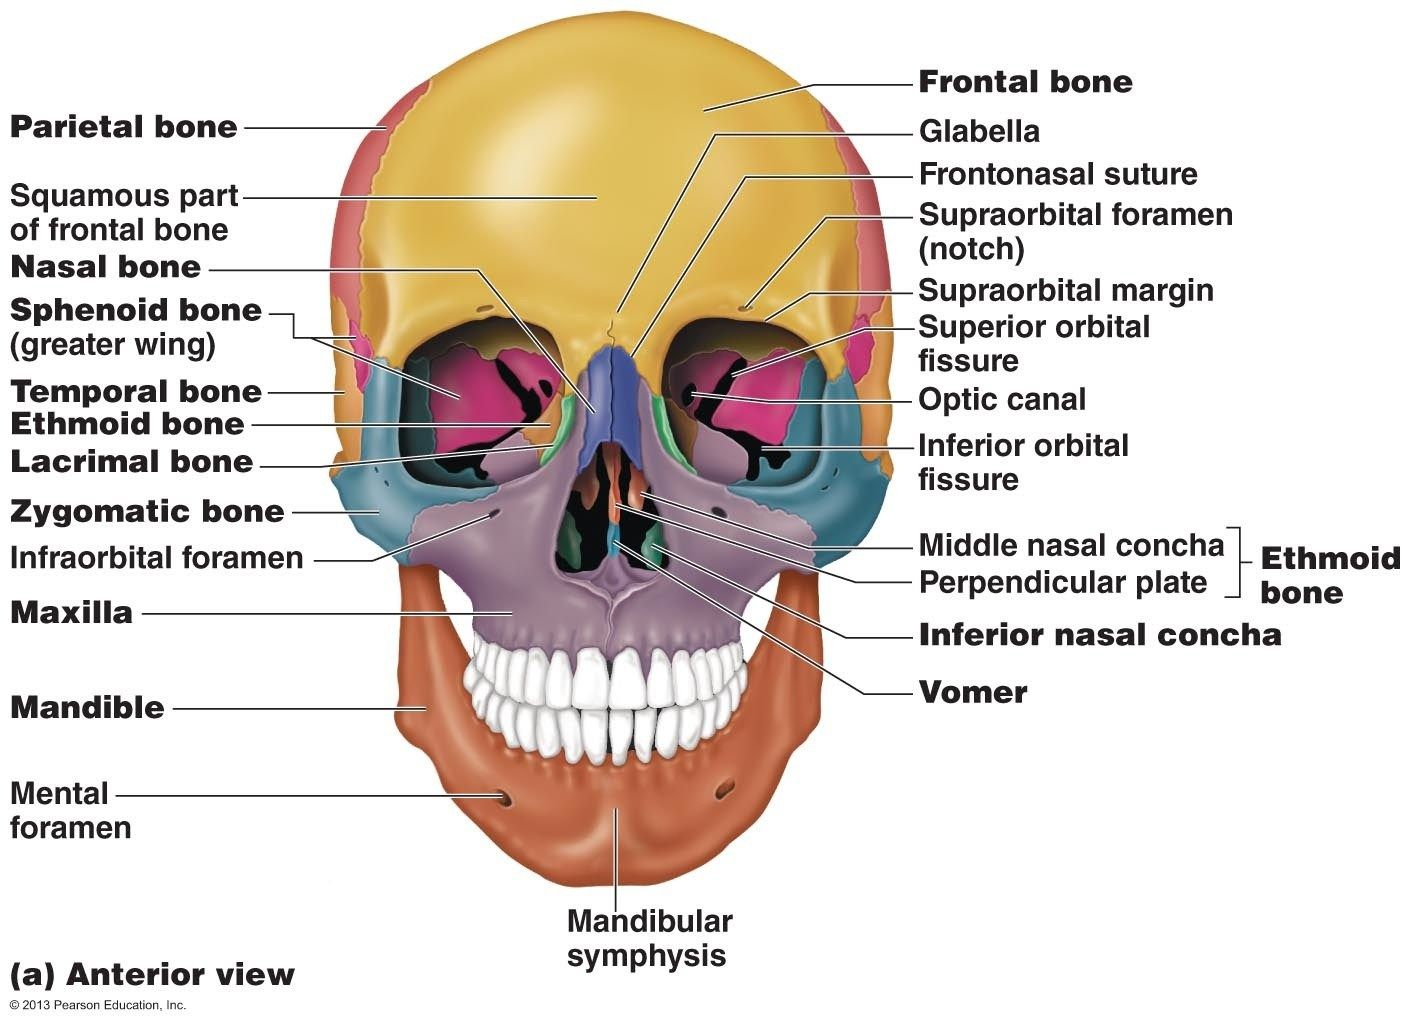 skull bones diagram wiring diagram verified Skull Bones Diagram Flash Cards